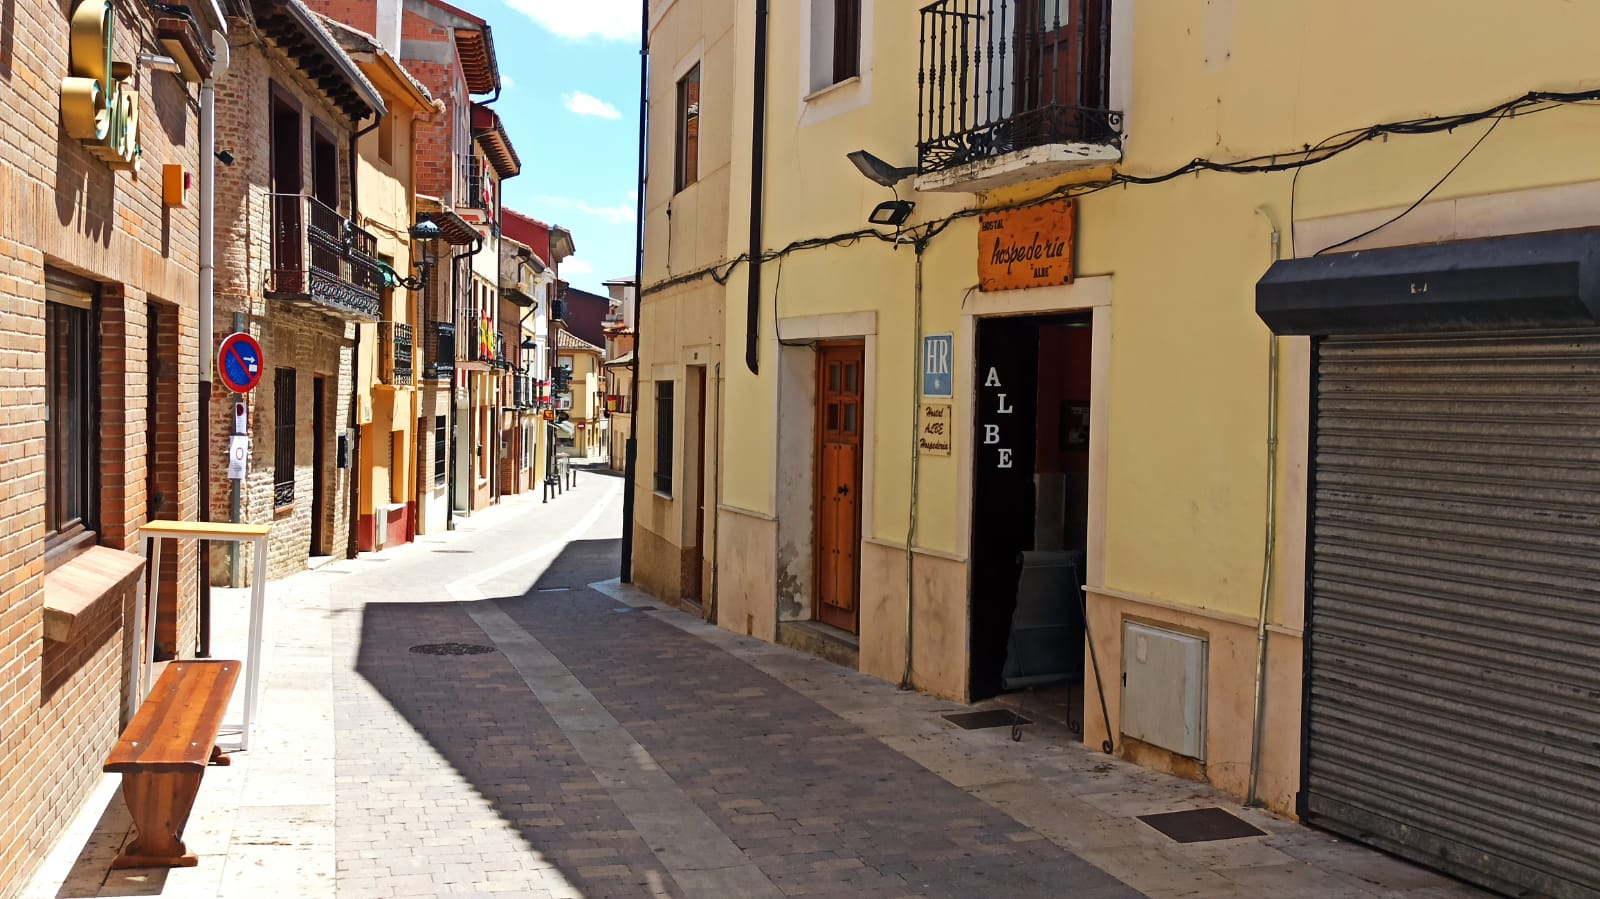 peatonalizar la calle Esteban Collantes